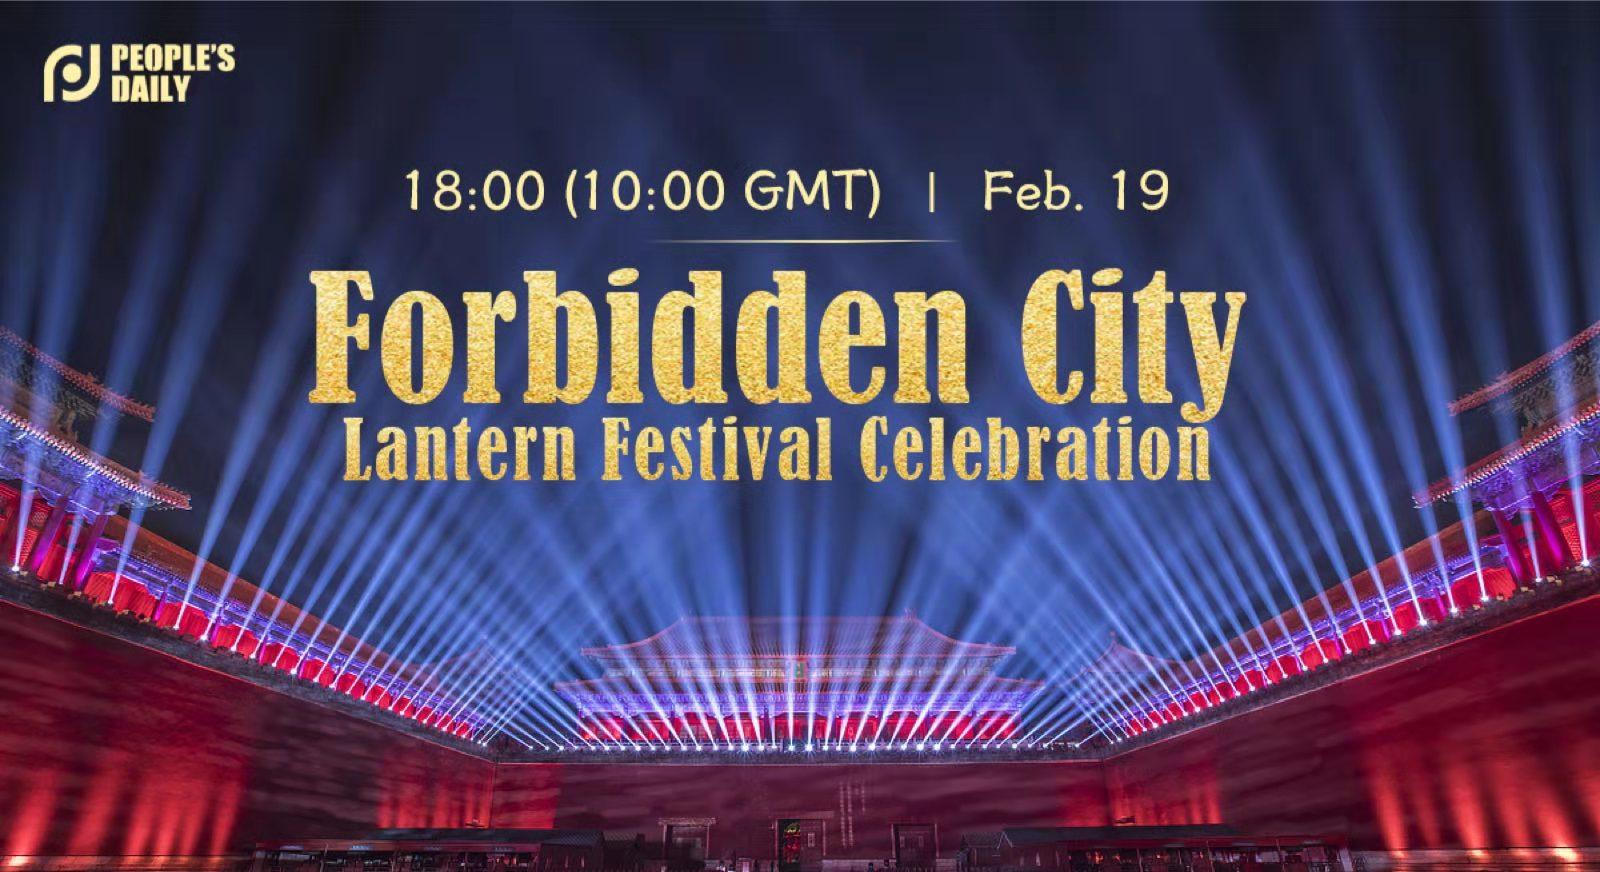 Night tour of Forbidden City